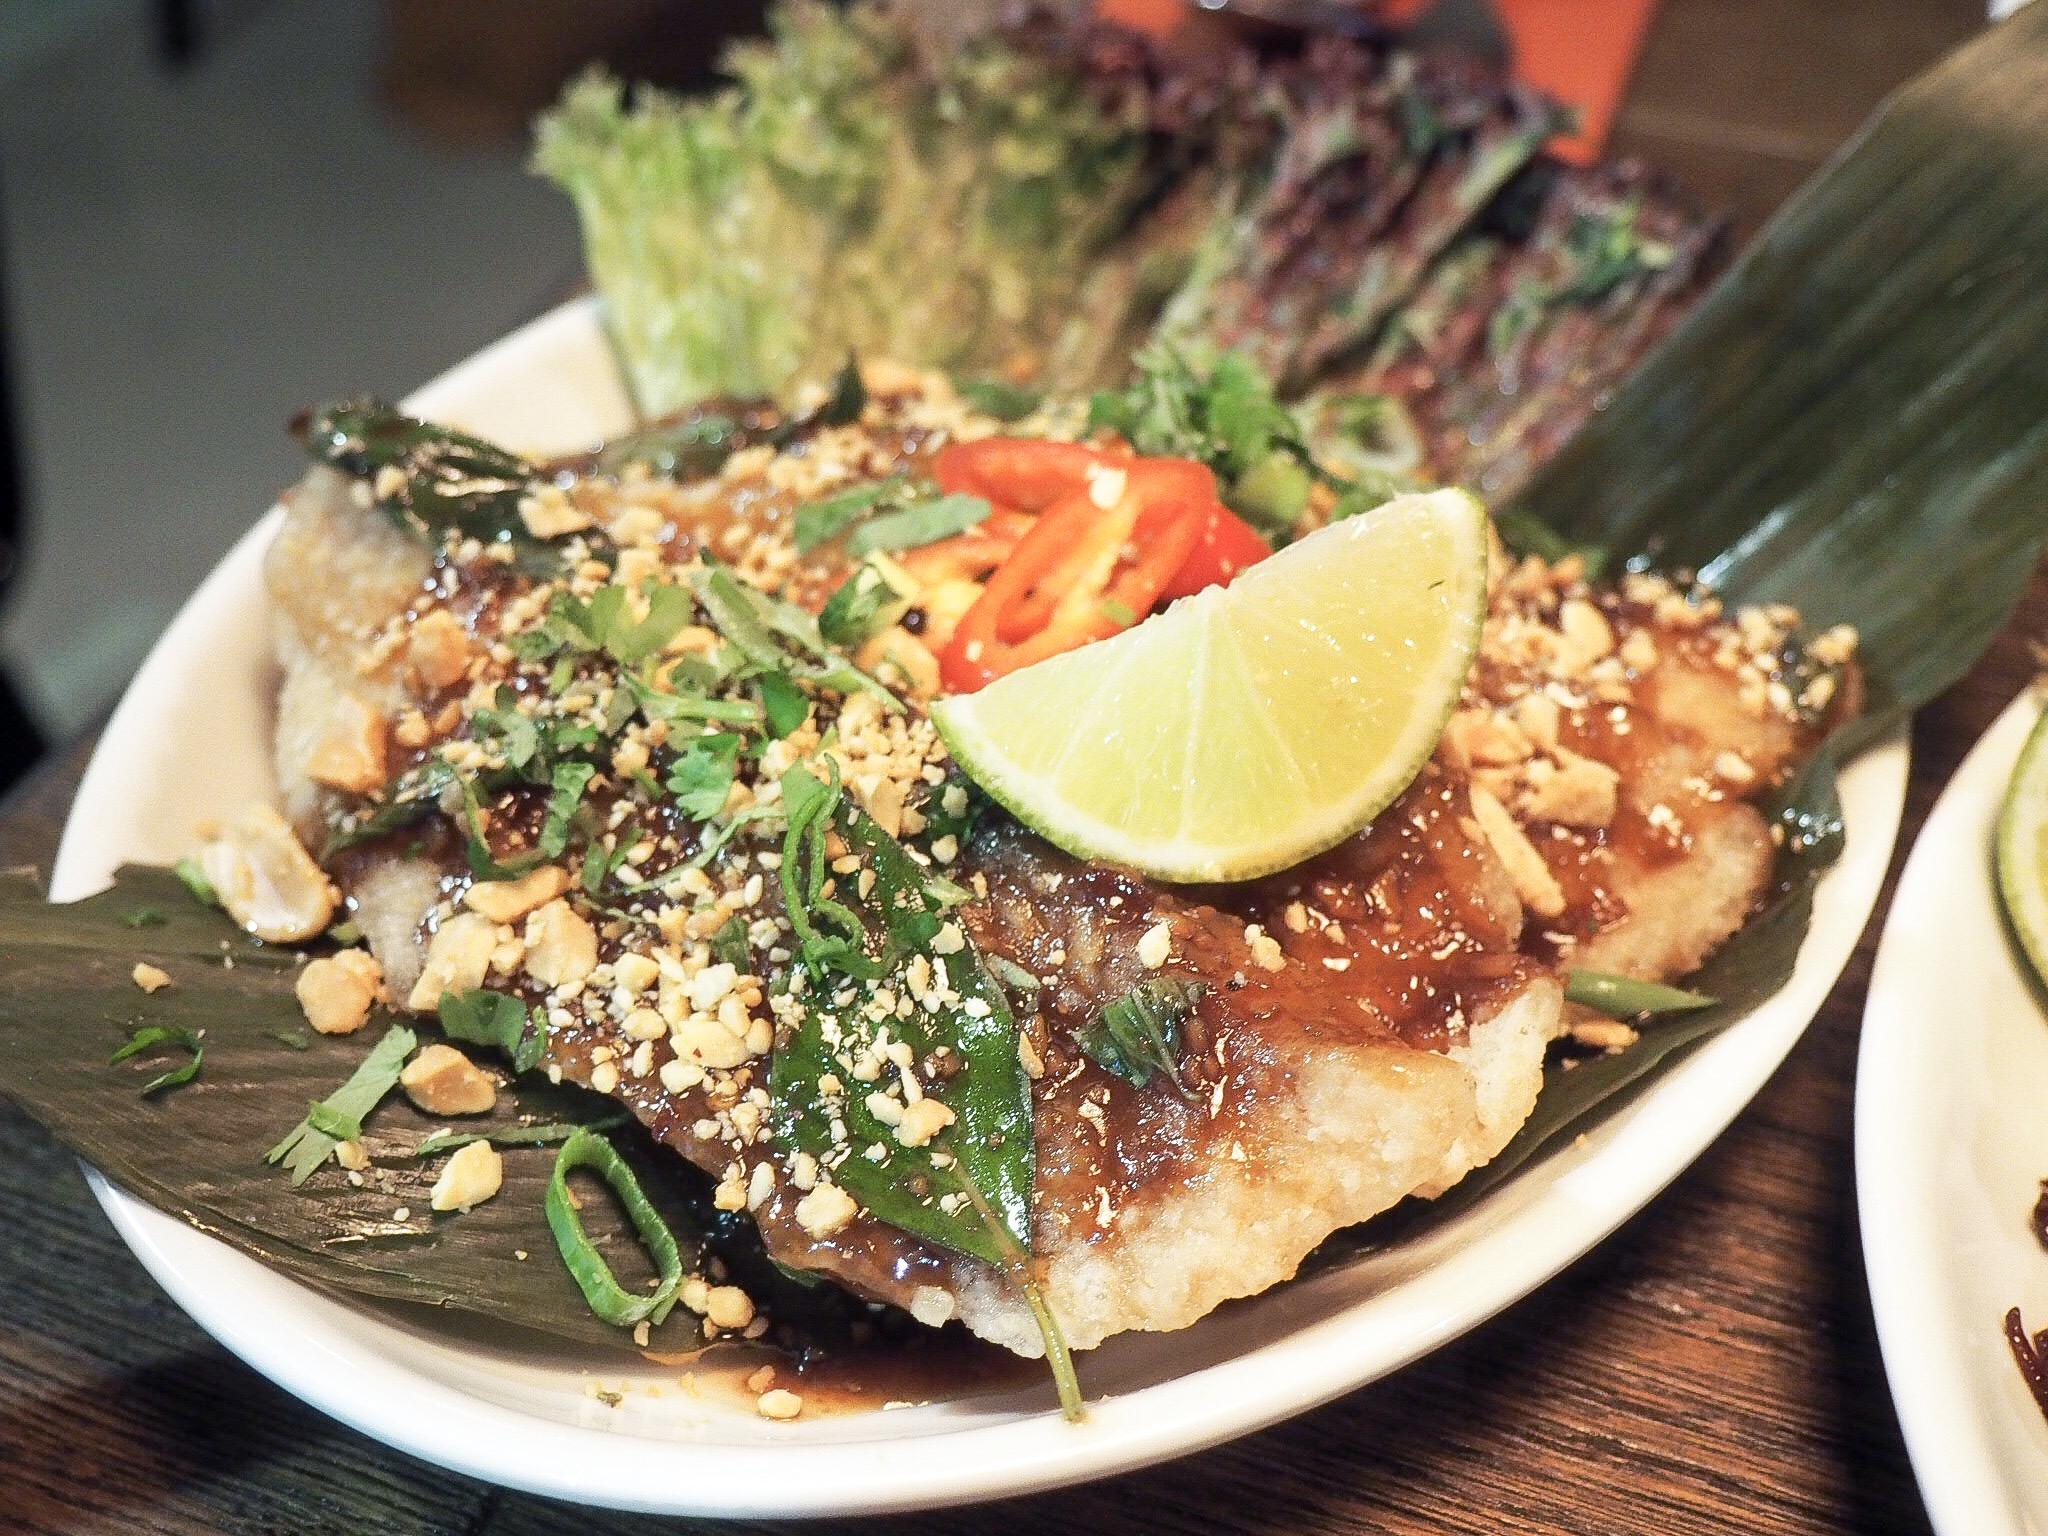 Tamarind crispy fish with thai basil glaze